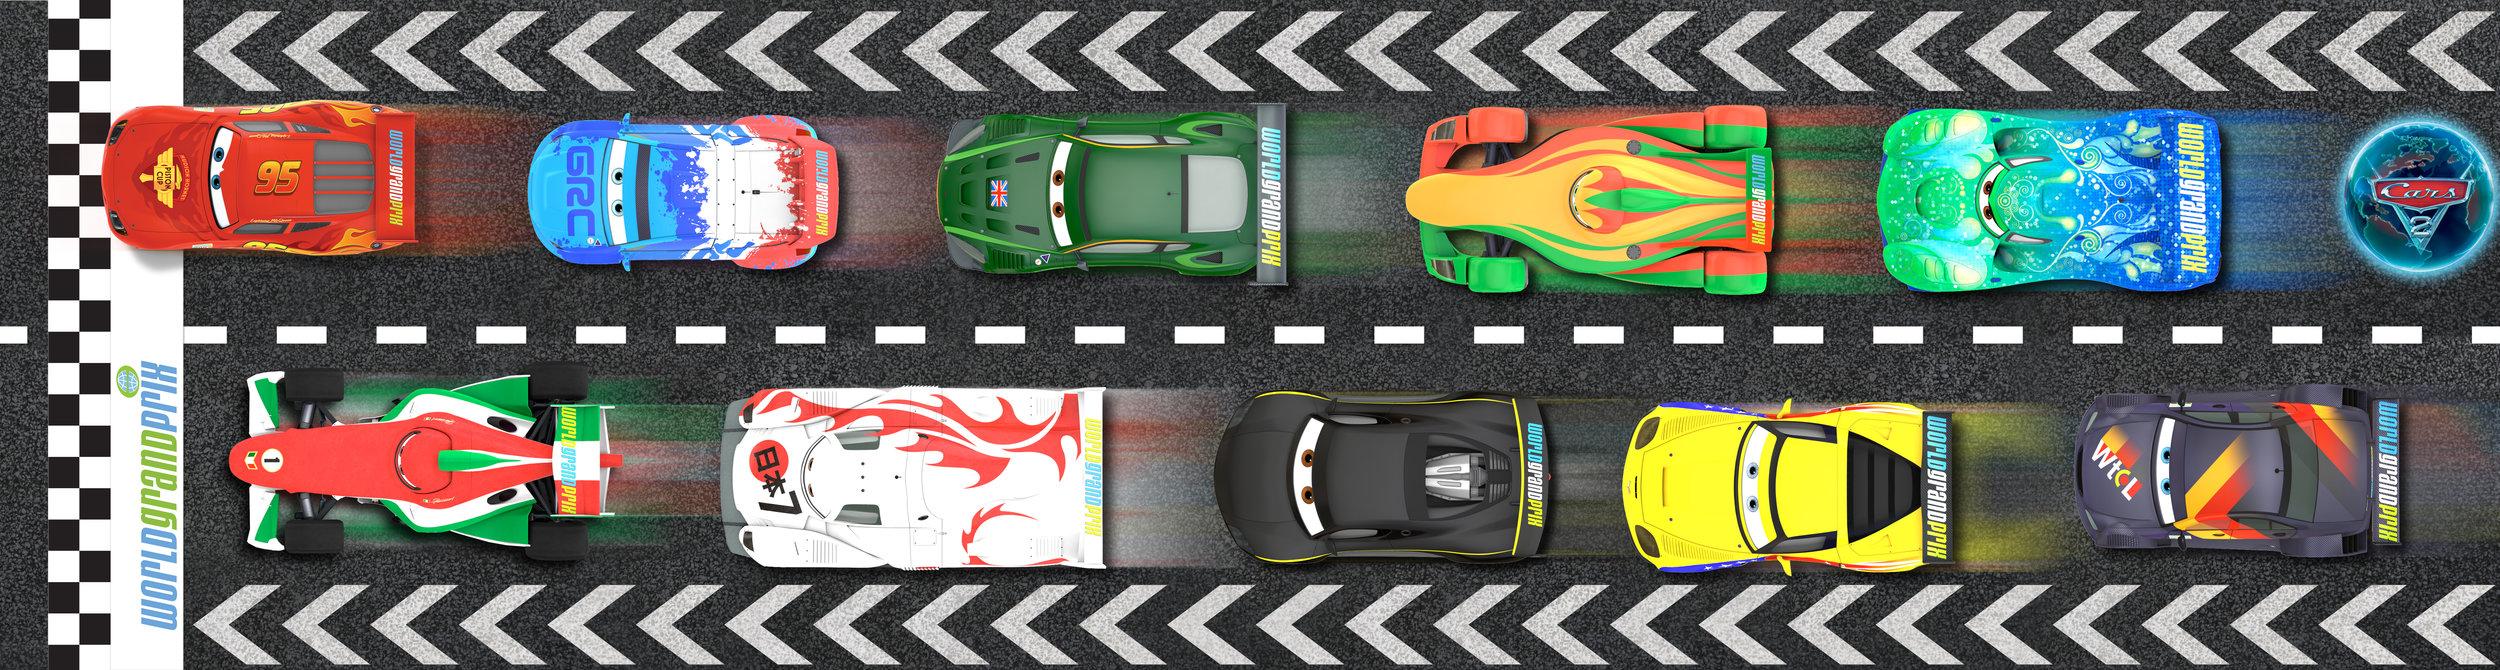 LIAB-Cars2-2.jpg